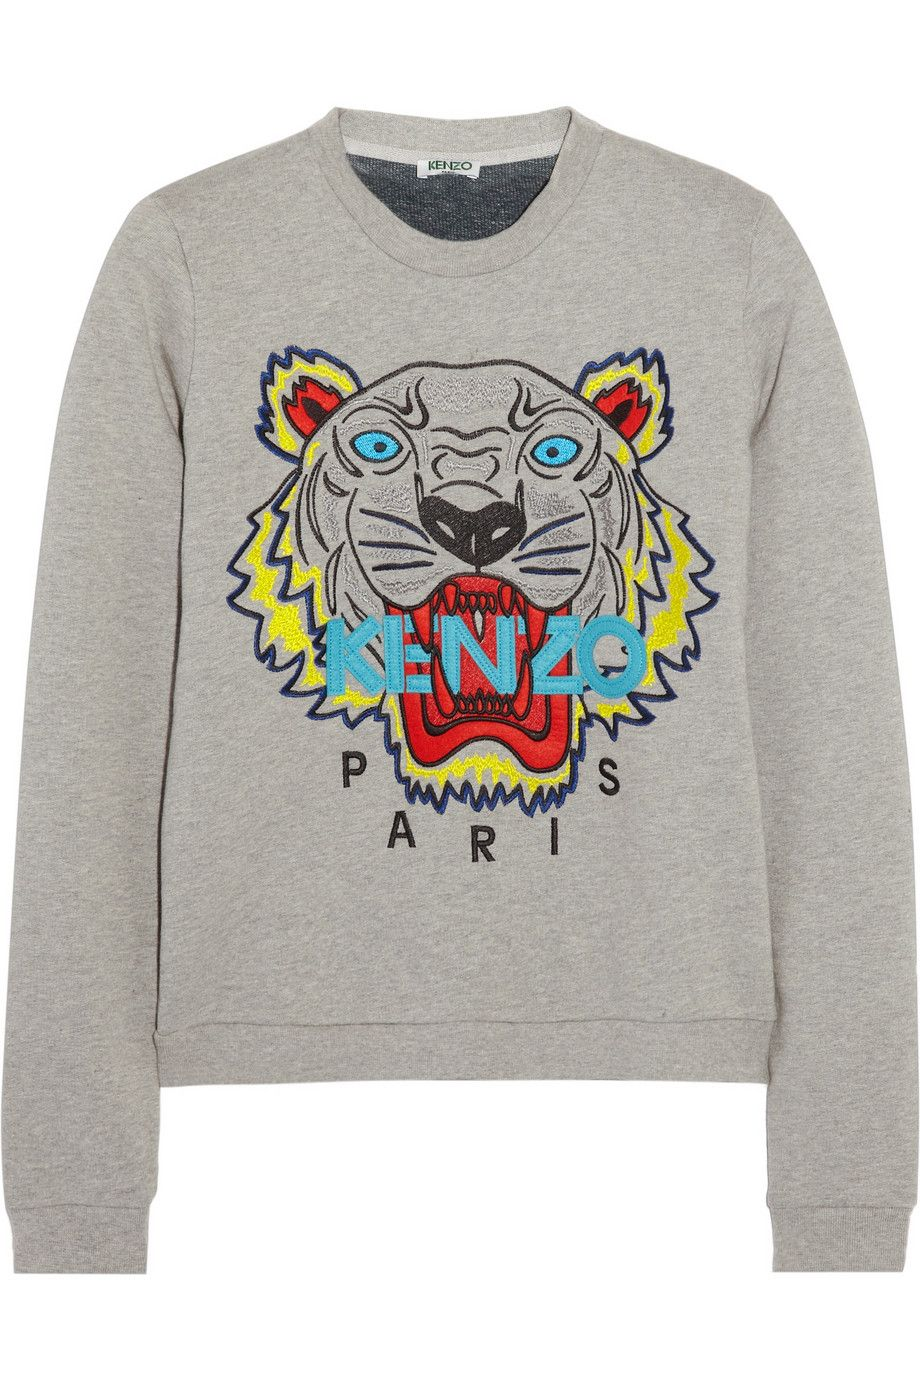 Pin by Sofie Bo on Très chic | Kenzo sweater, Sweatshirts